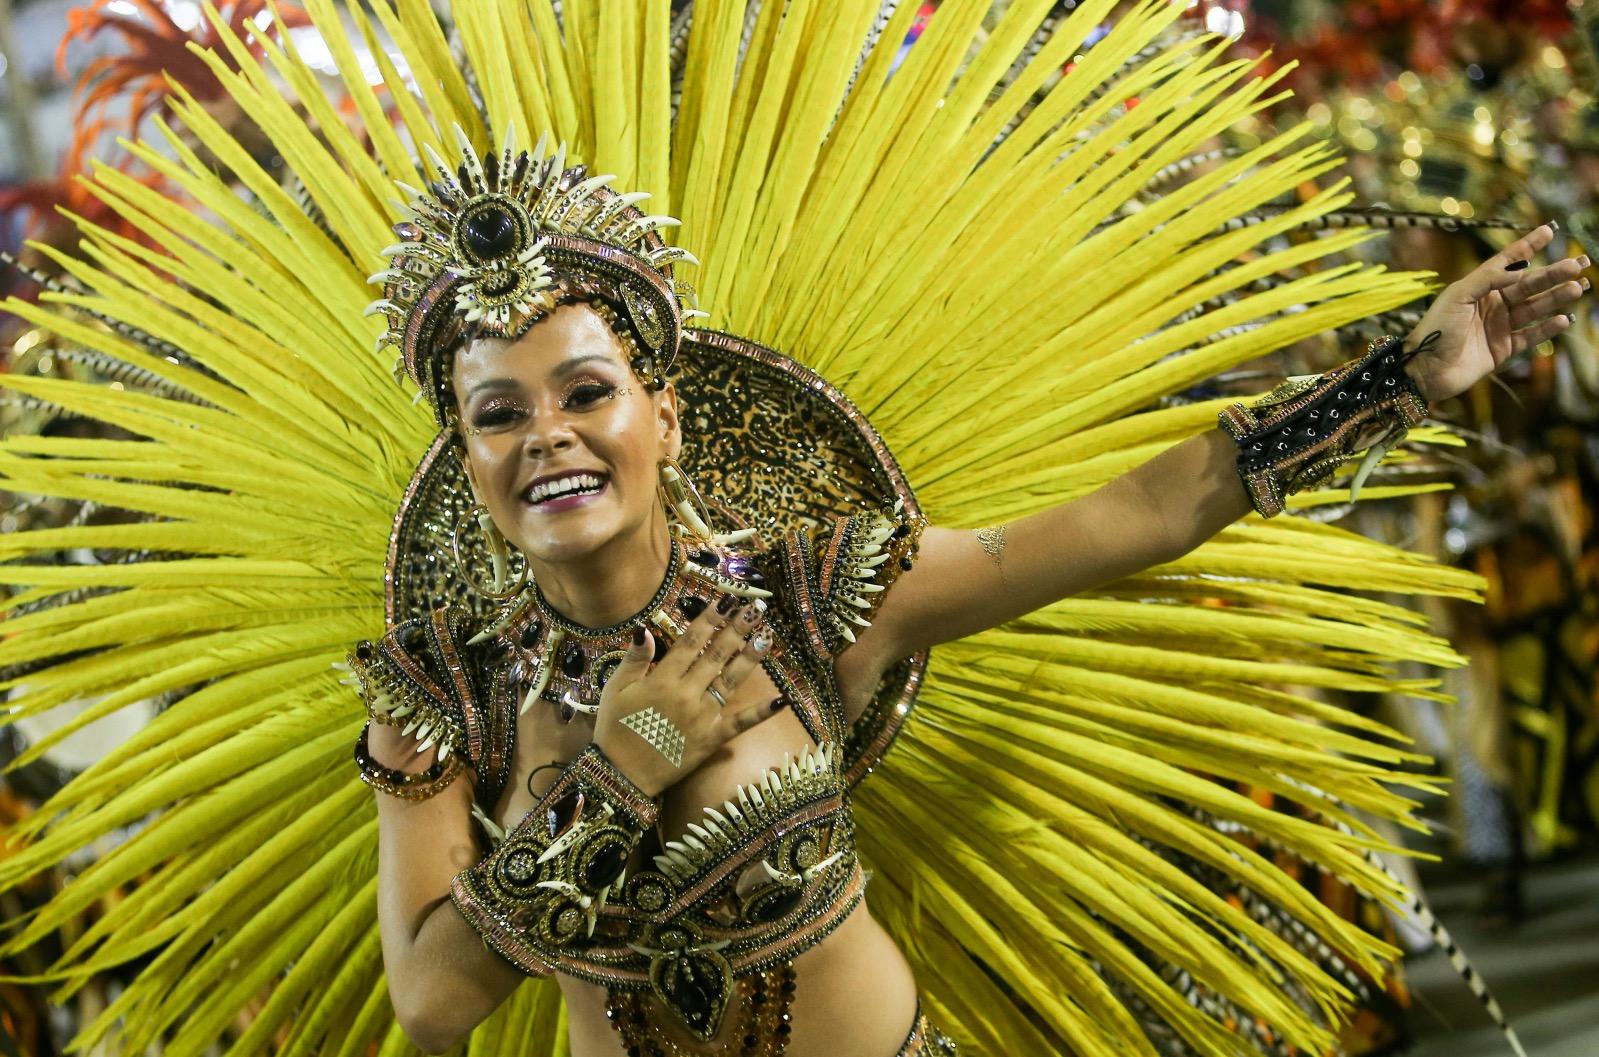 LILY: Nudes in rio de janeiro carnival parade